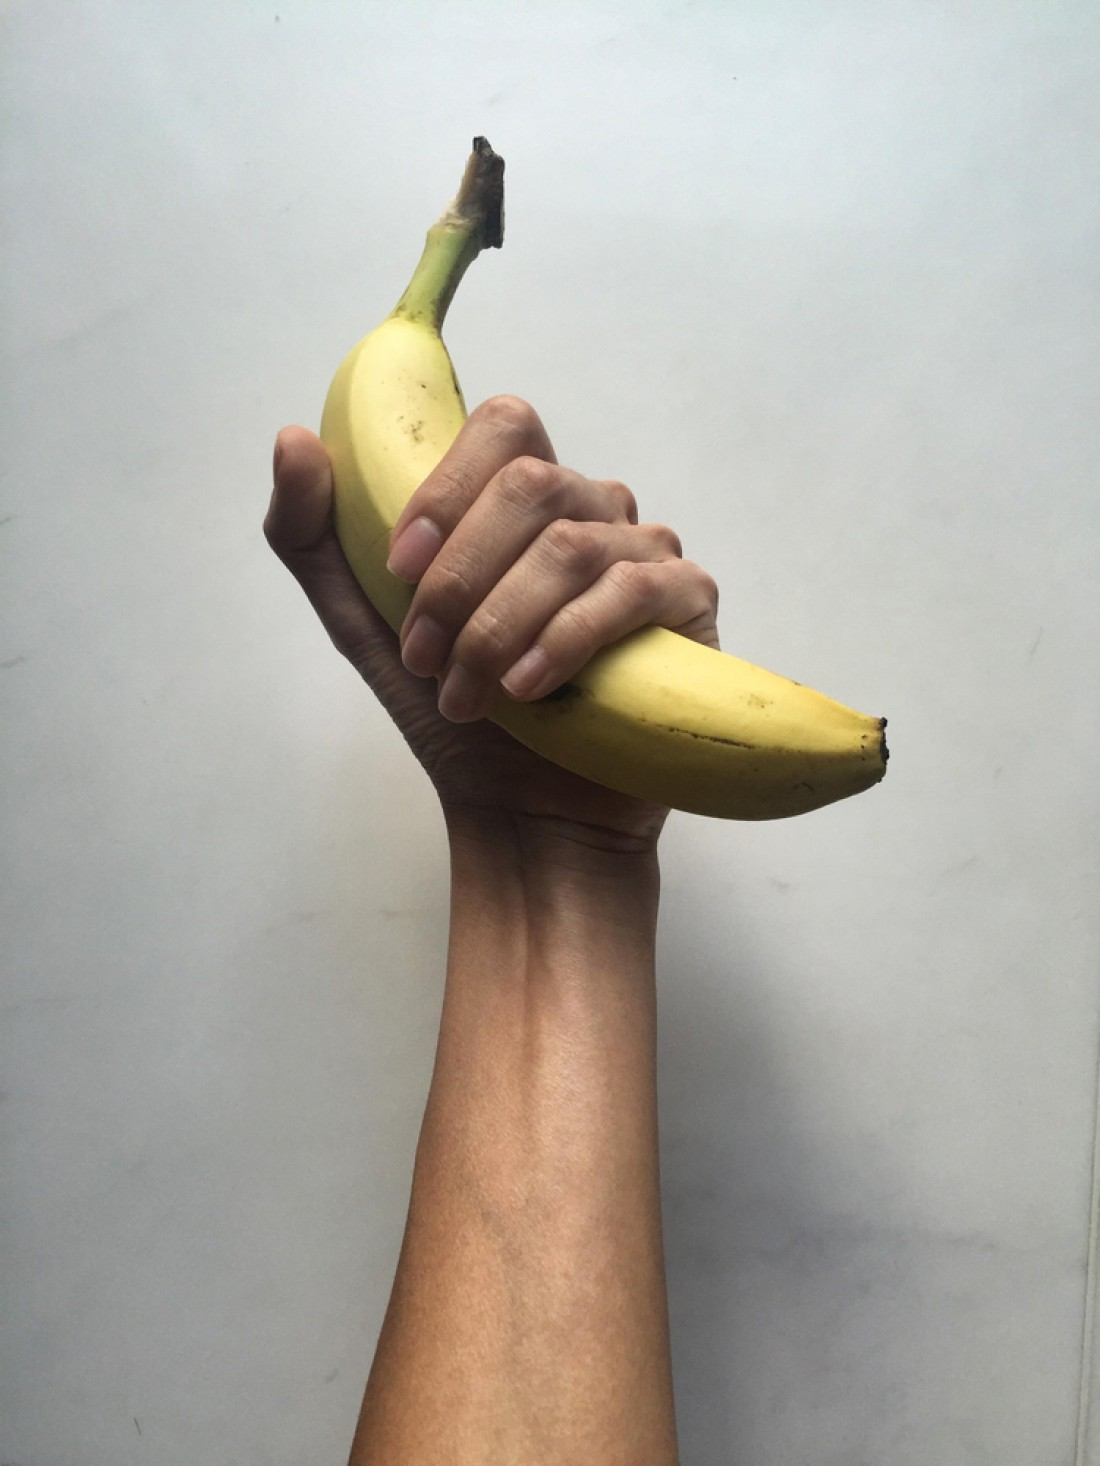 Нравится ли парням, когда их доводят до оргазма при помощи руки